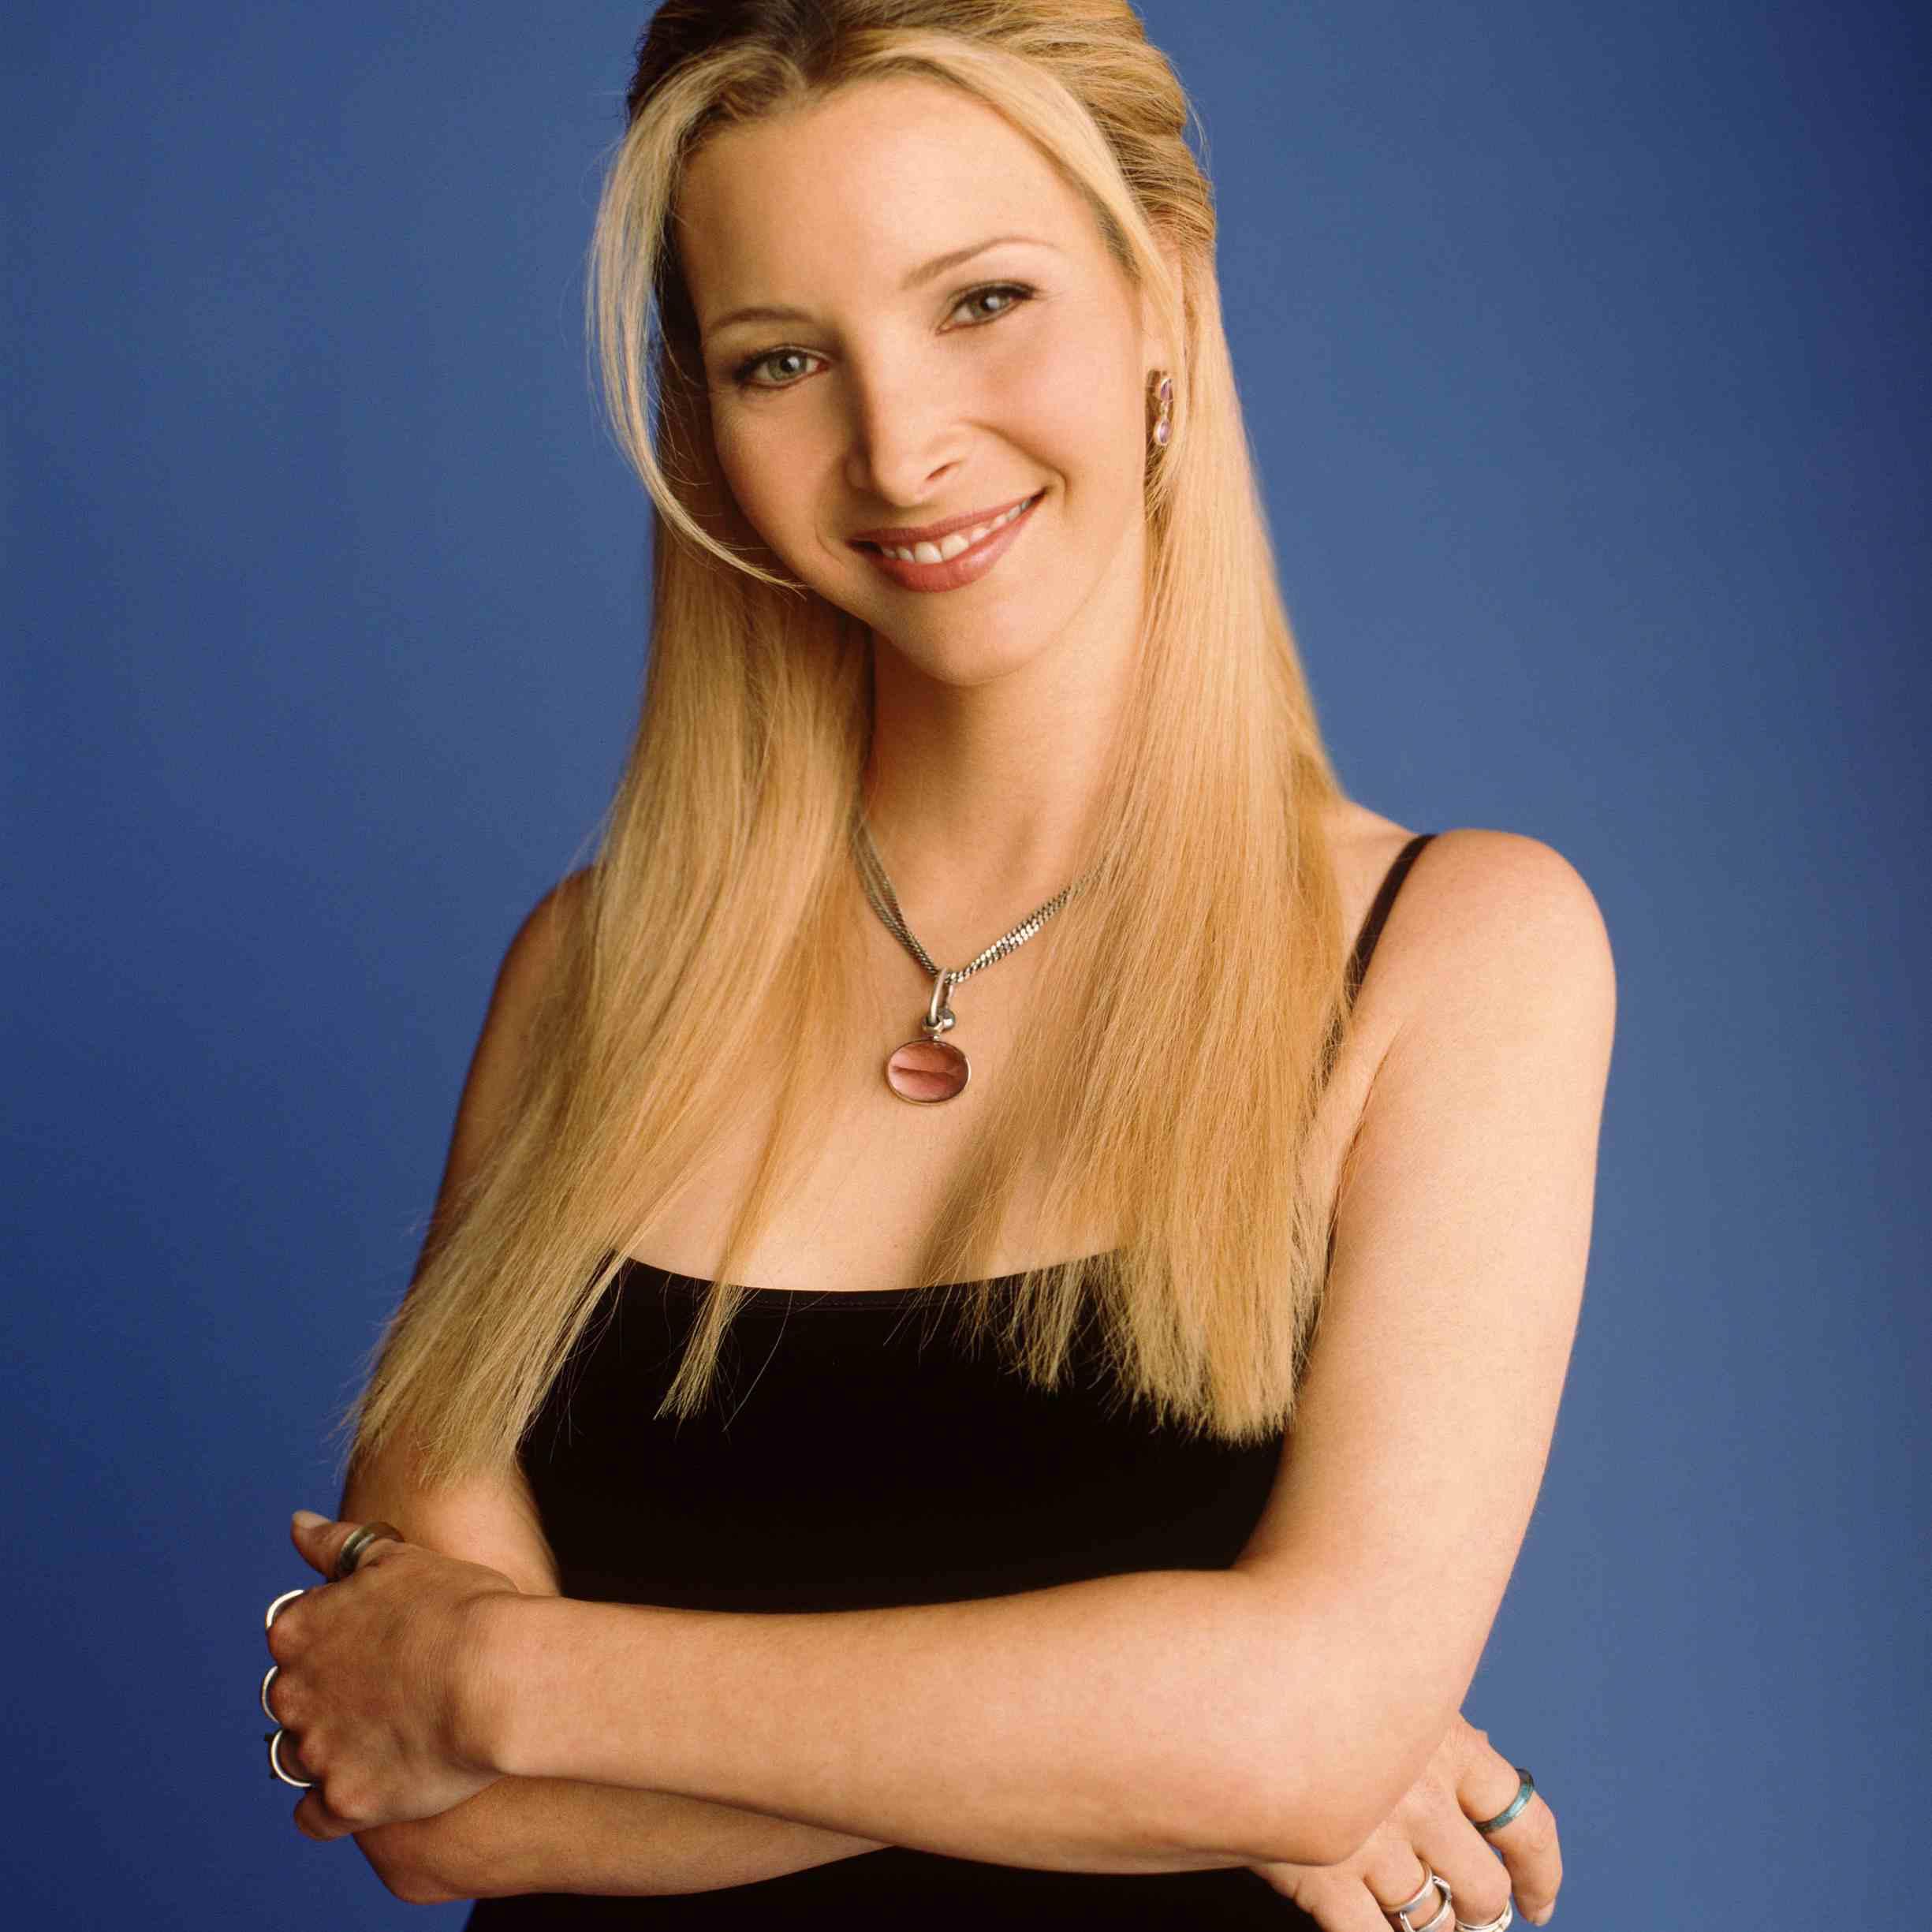 Portrait of Lisa Kudrow against blue background.